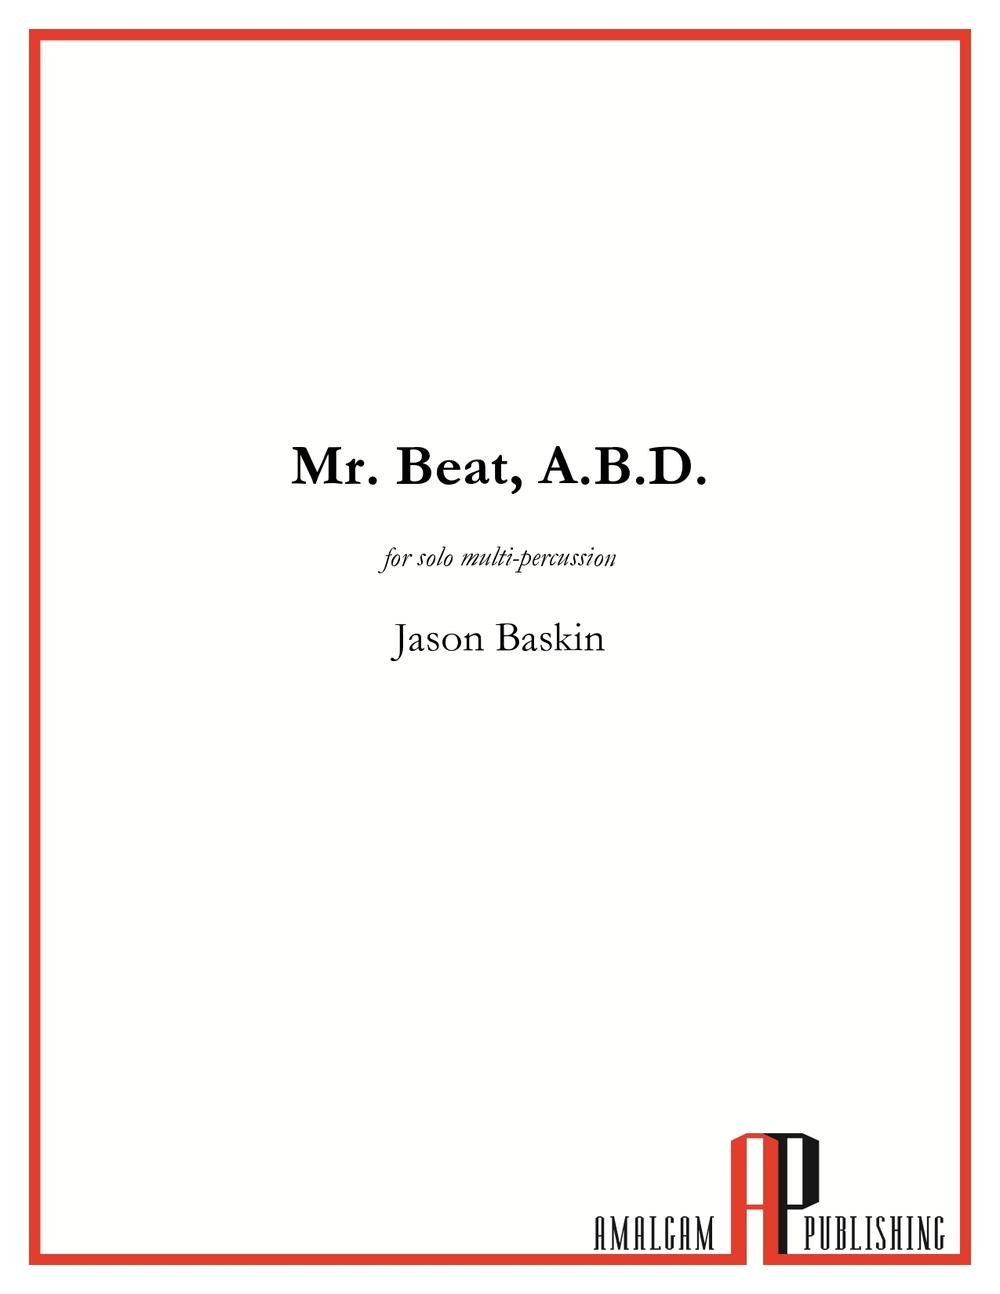 Mr. Beat, A.B.D..jpg